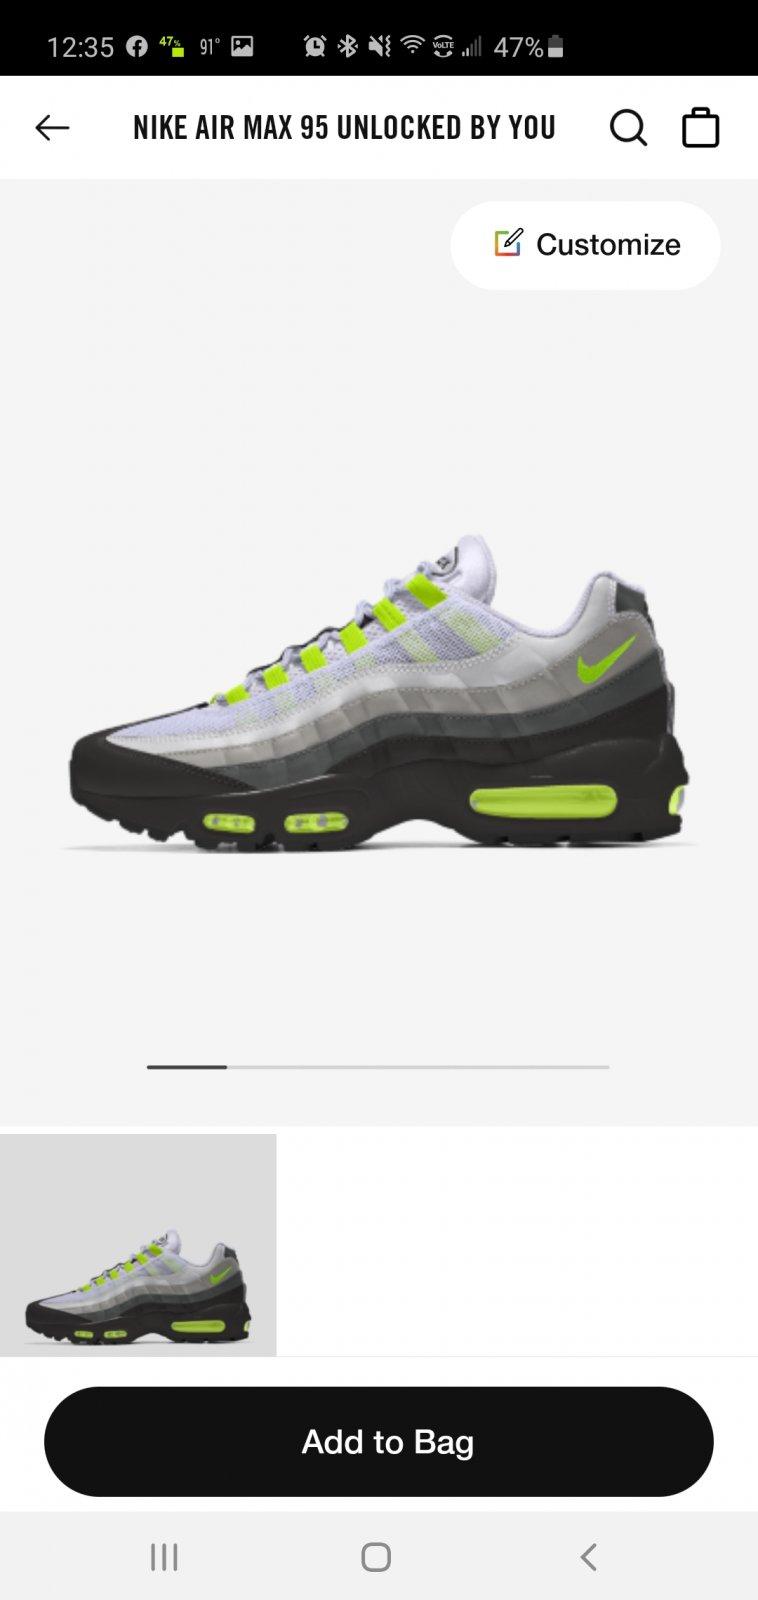 Screenshot_20200706-123508_Nike.jpg